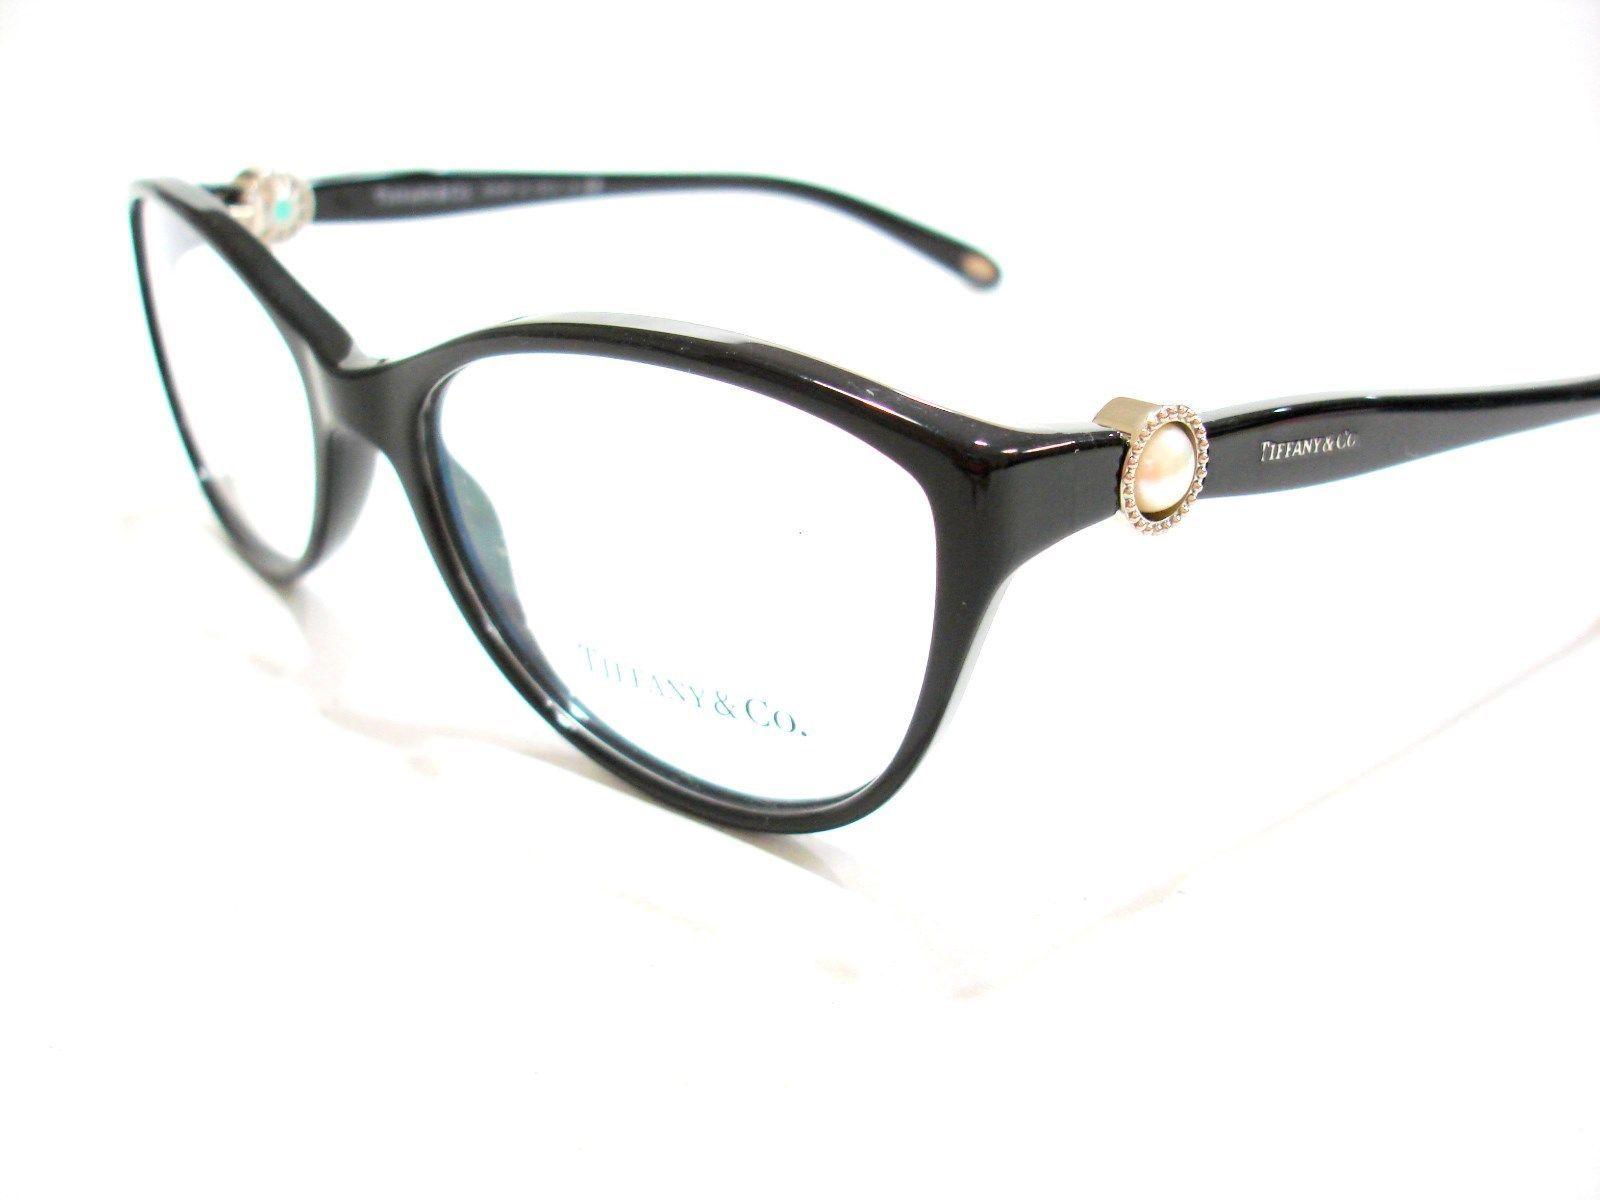 Tiffany & Co. Eyeglass Frame: 50 listings